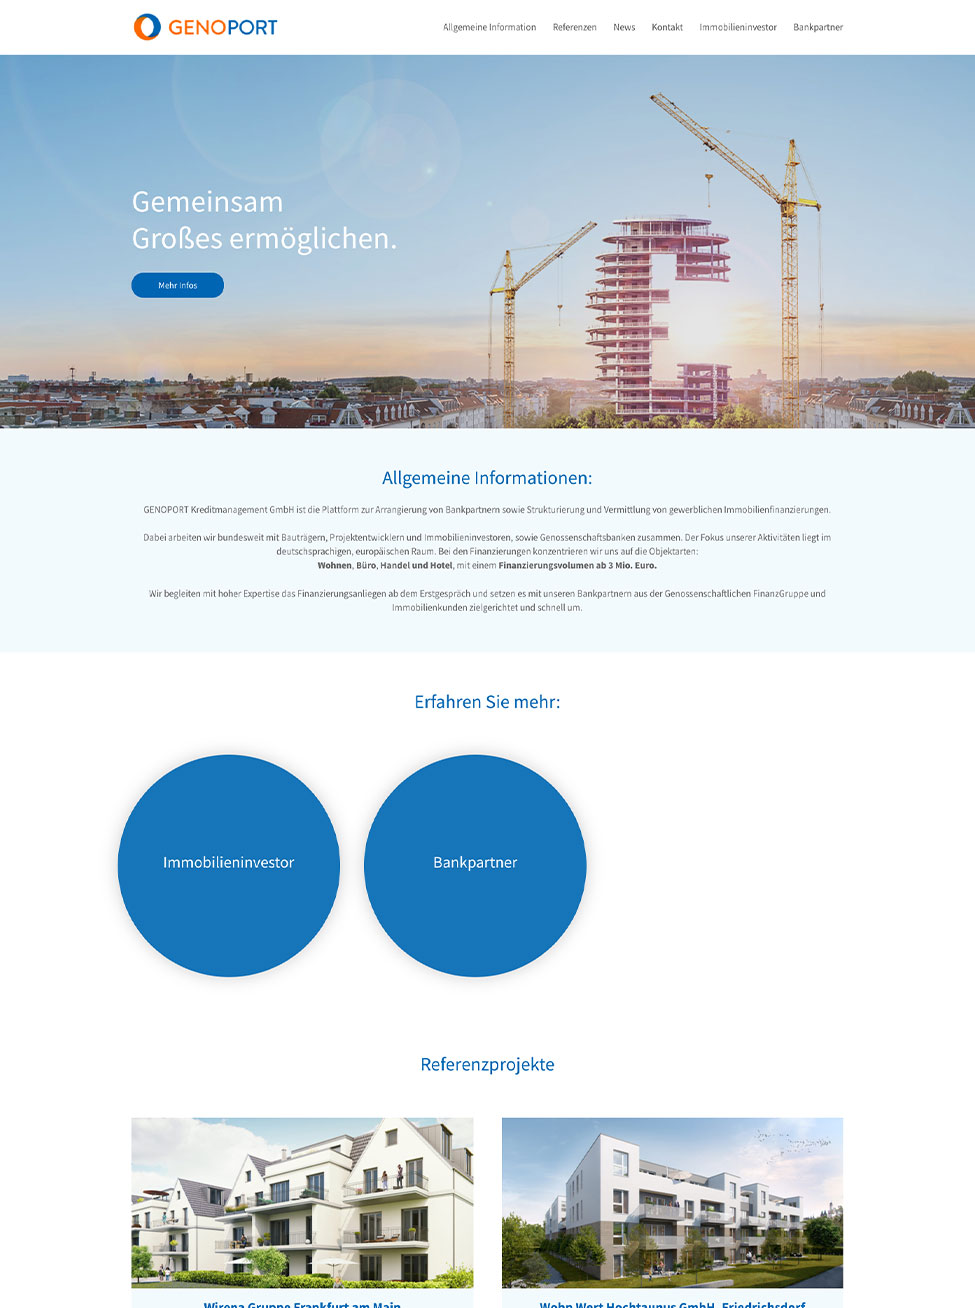 Genoport Kreditmanagement GmbH